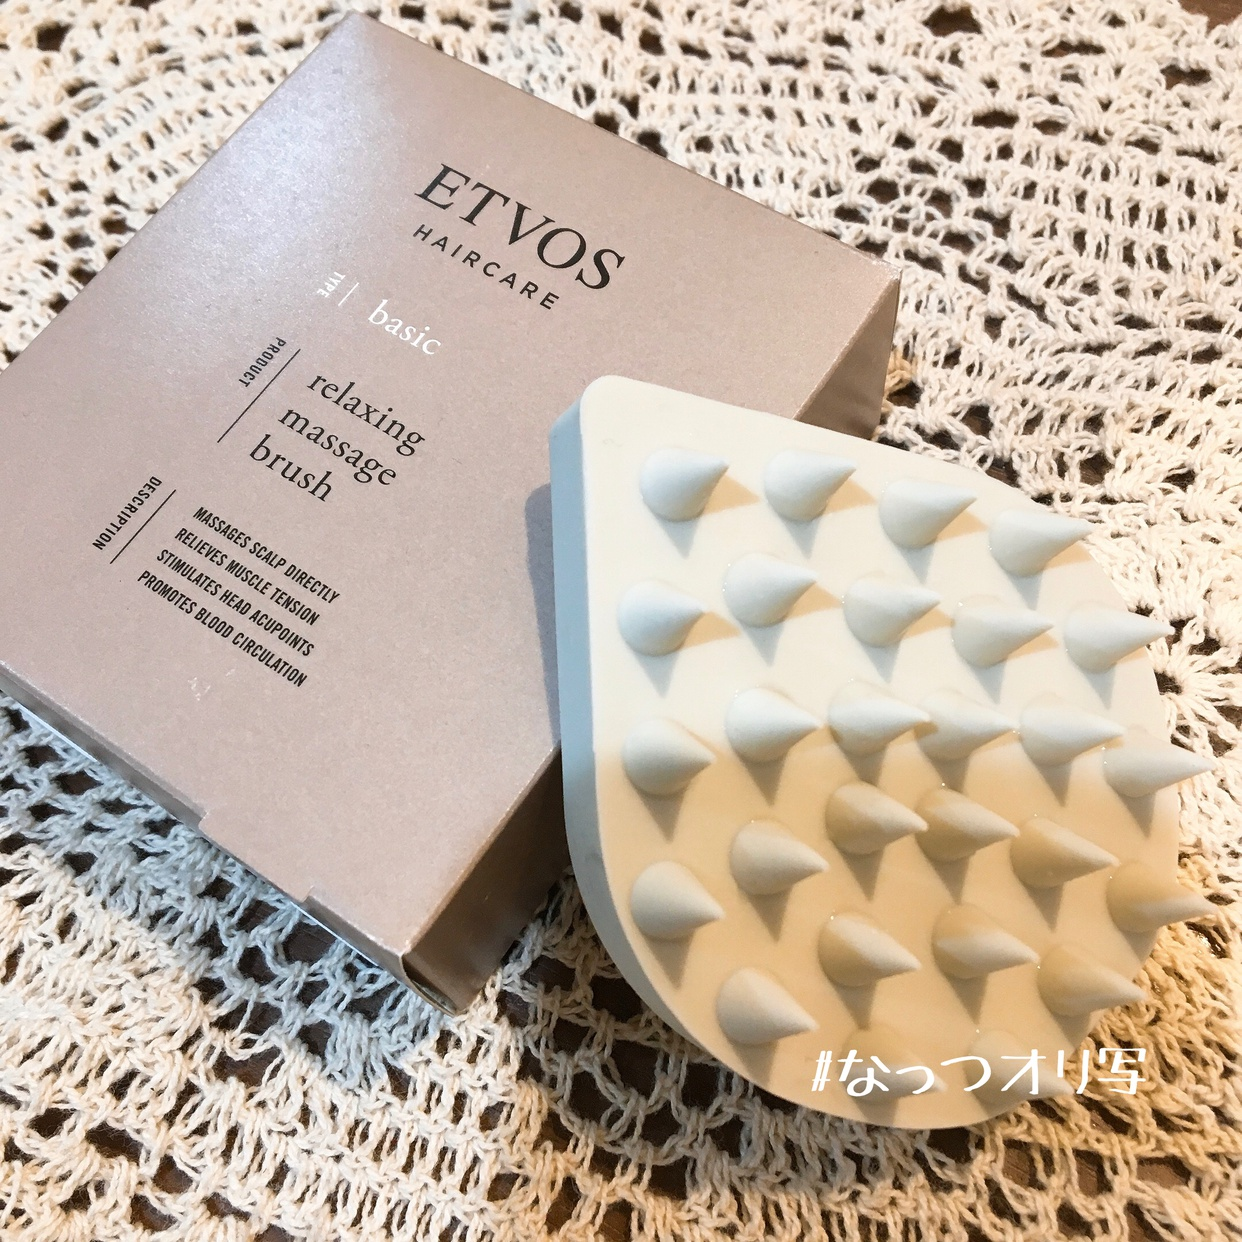 ETVOS(エトヴォス) リラクシングマッサージブラシを使ったなっつさんのクチコミ画像2